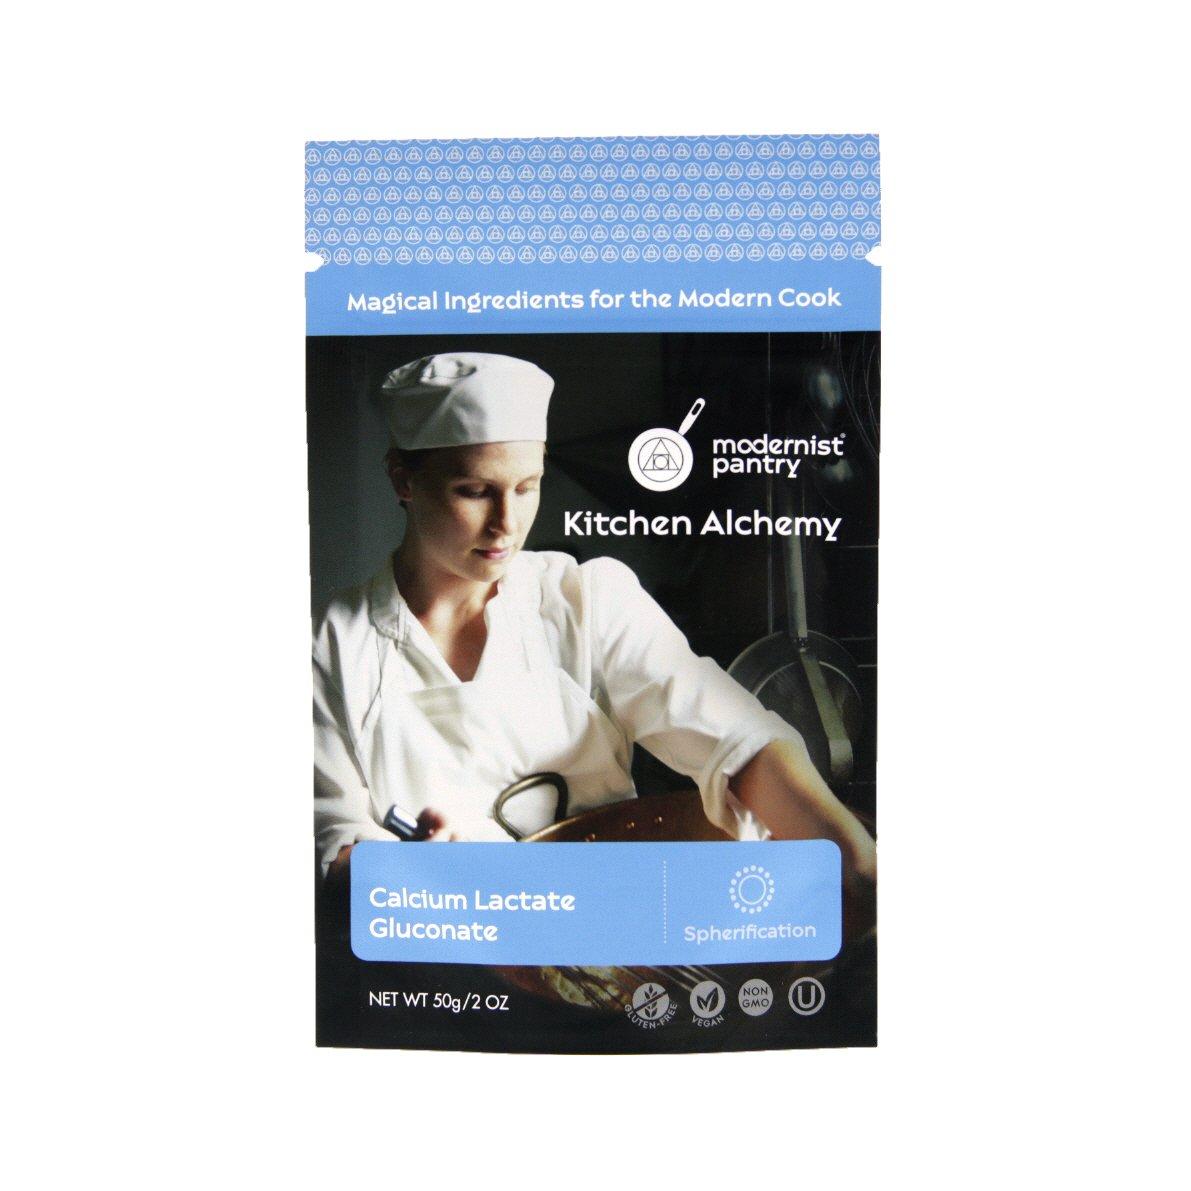 Pure Calcium Lactate Gluconate ⊘ Non-GMO ☮ Vegan ✡ OU Kosher Certified - 50g/2oz